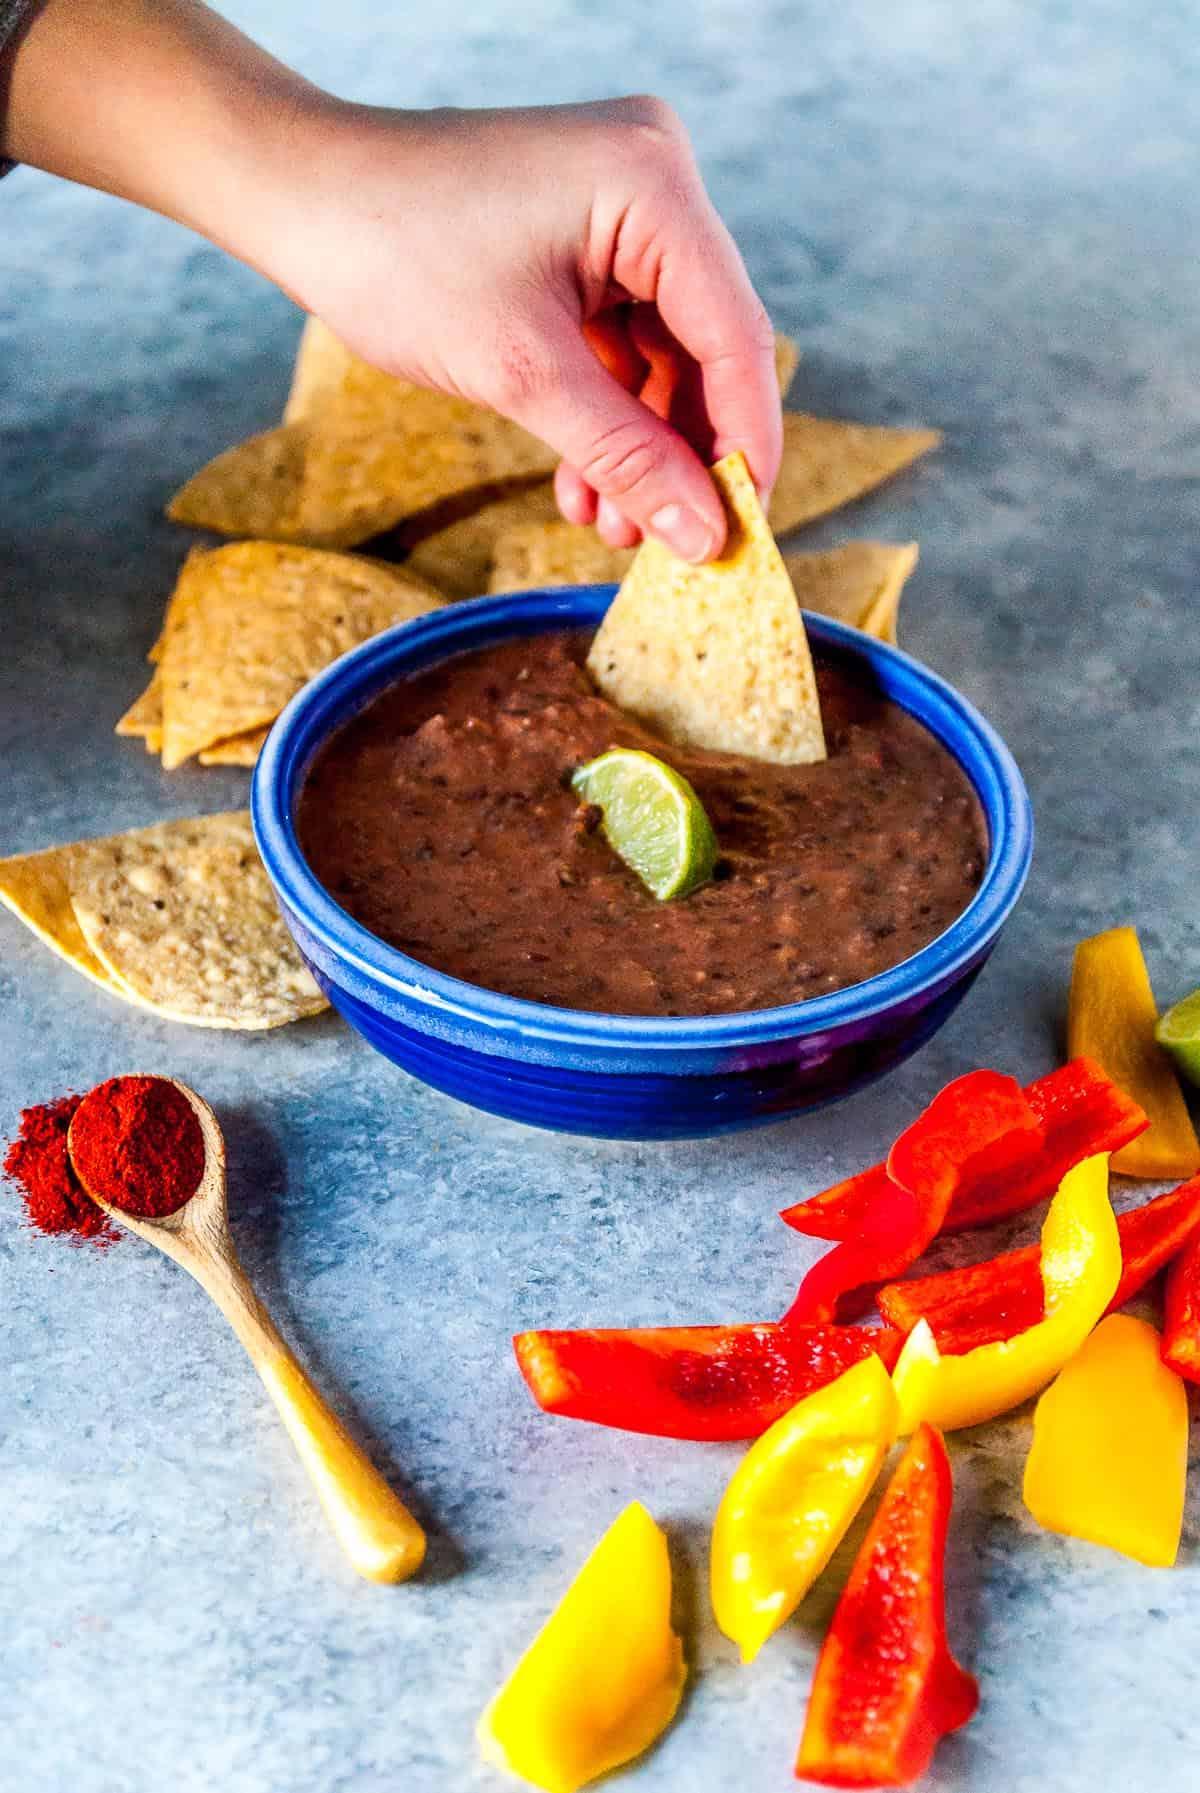 dipping a tortilla chip into vegan black bean dip